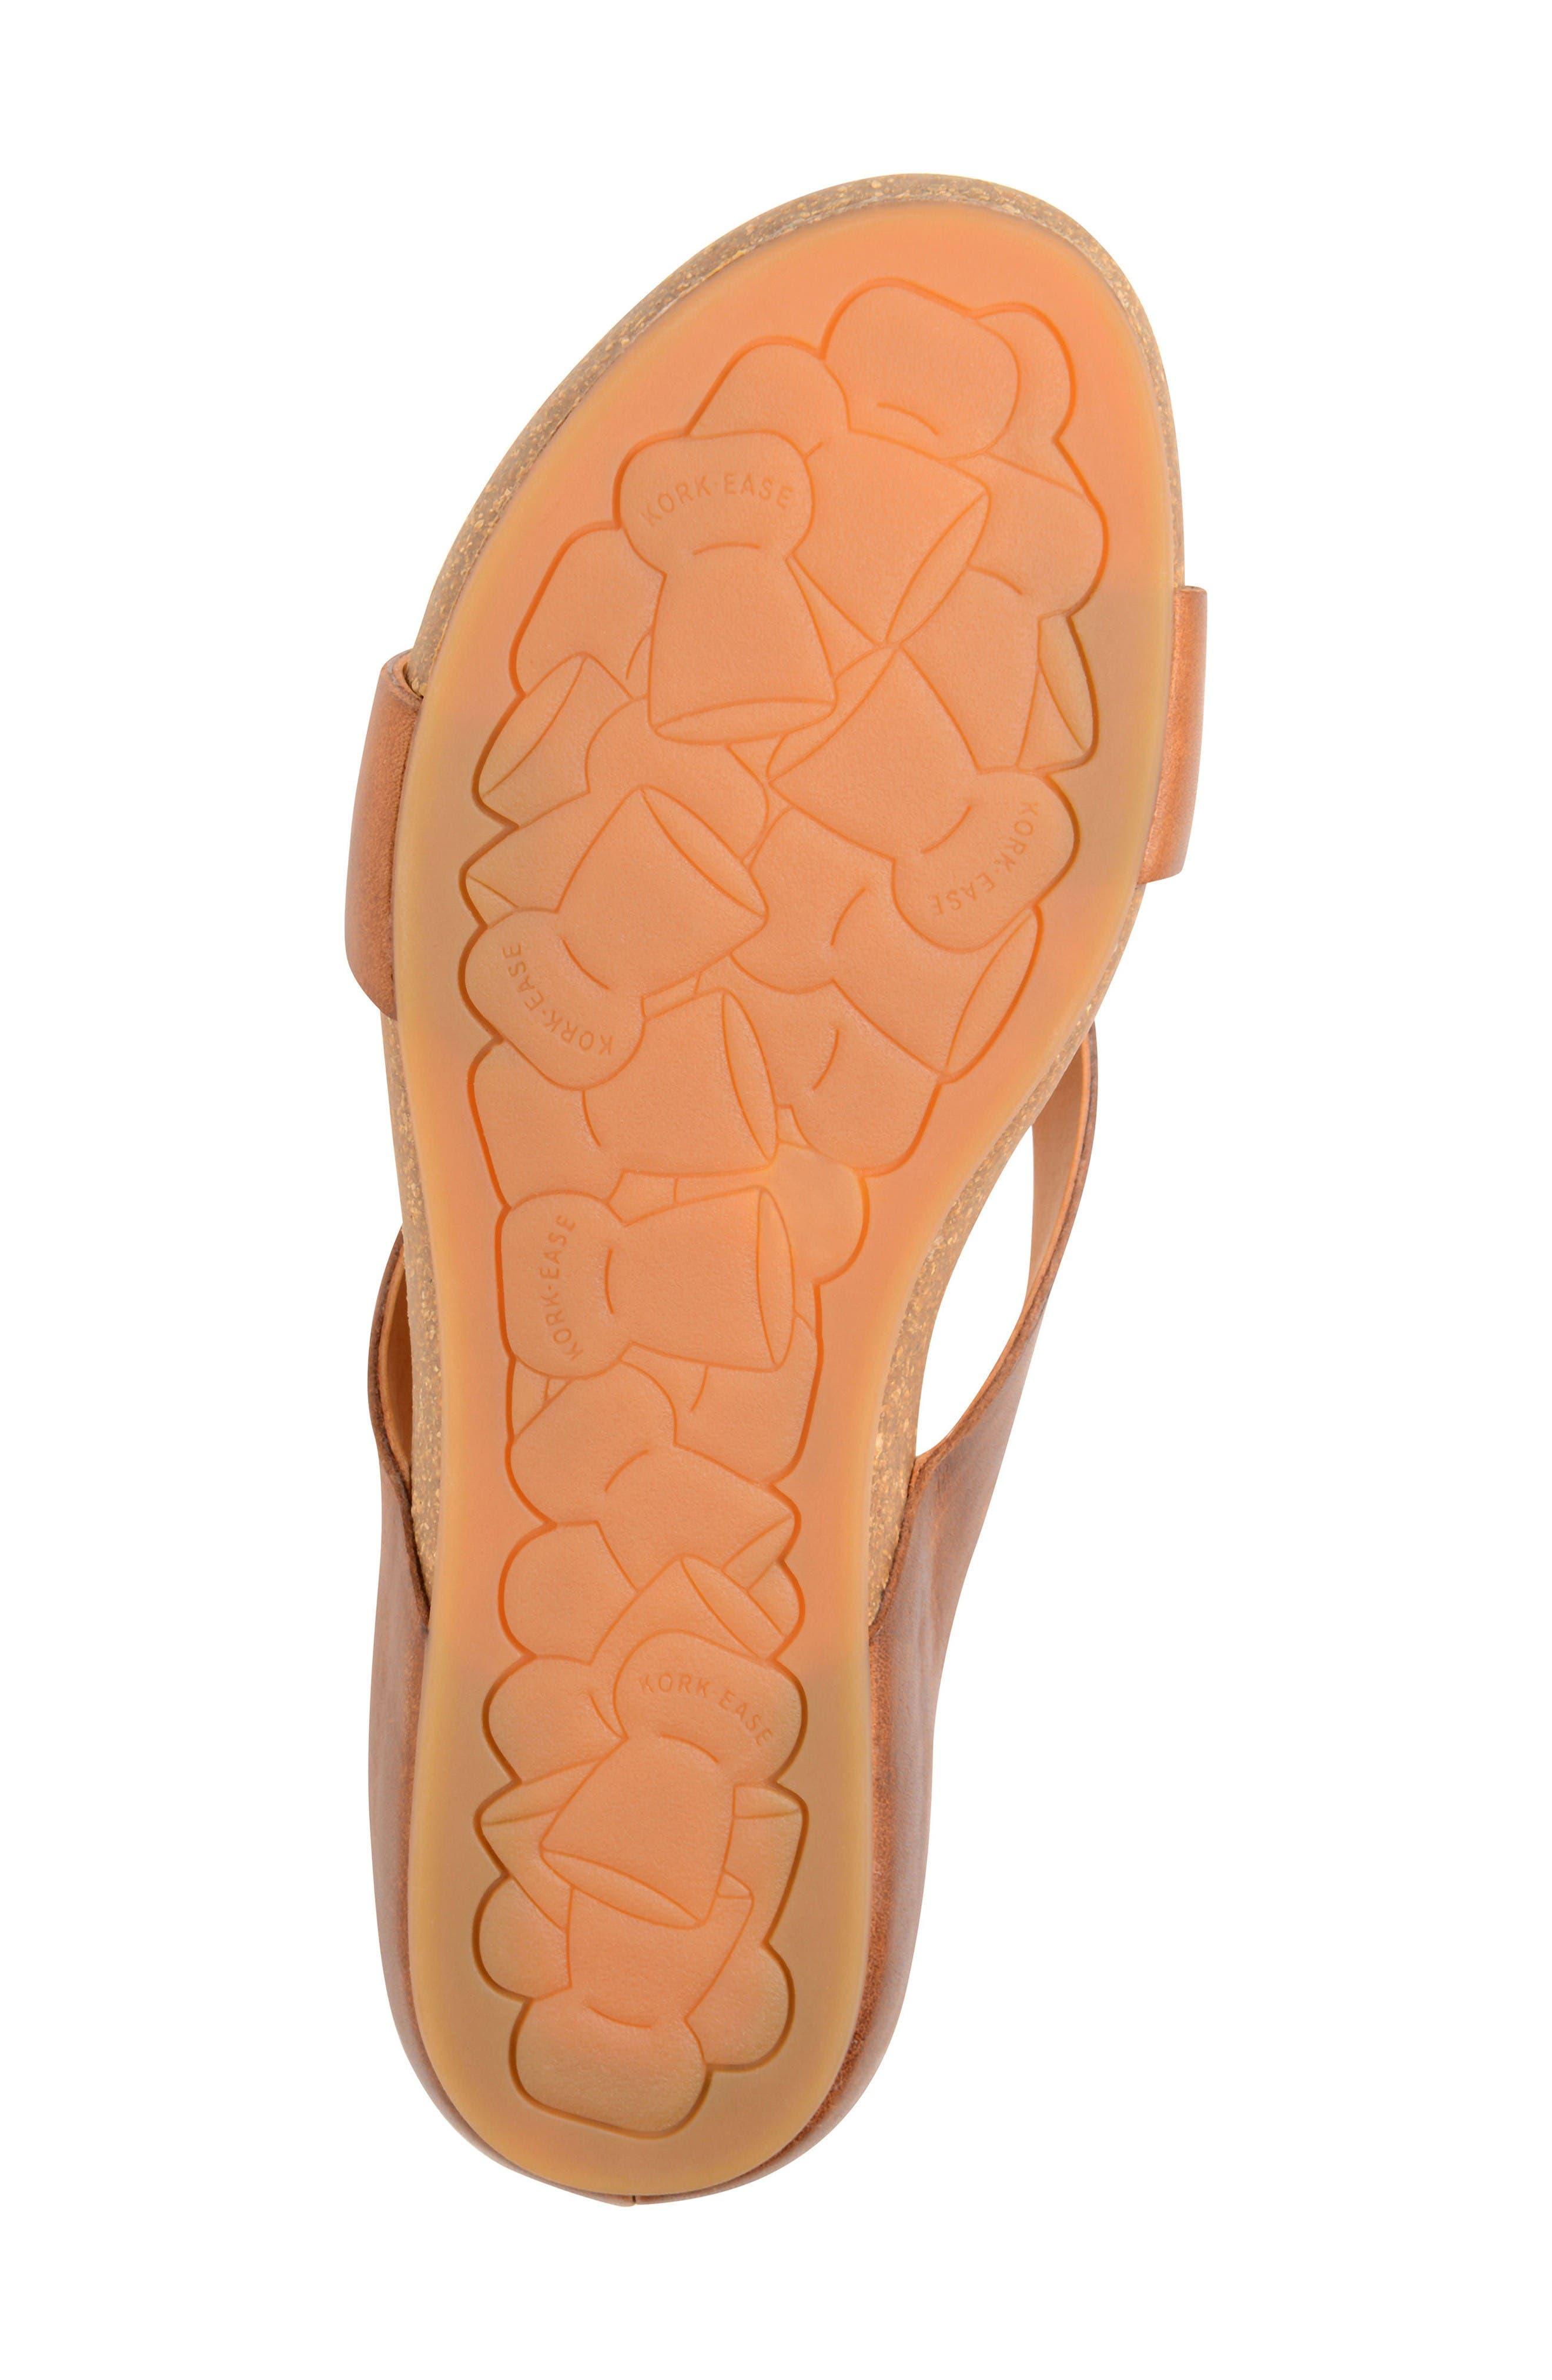 Devoe Sandal,                             Alternate thumbnail 4, color,                             Brown Leather